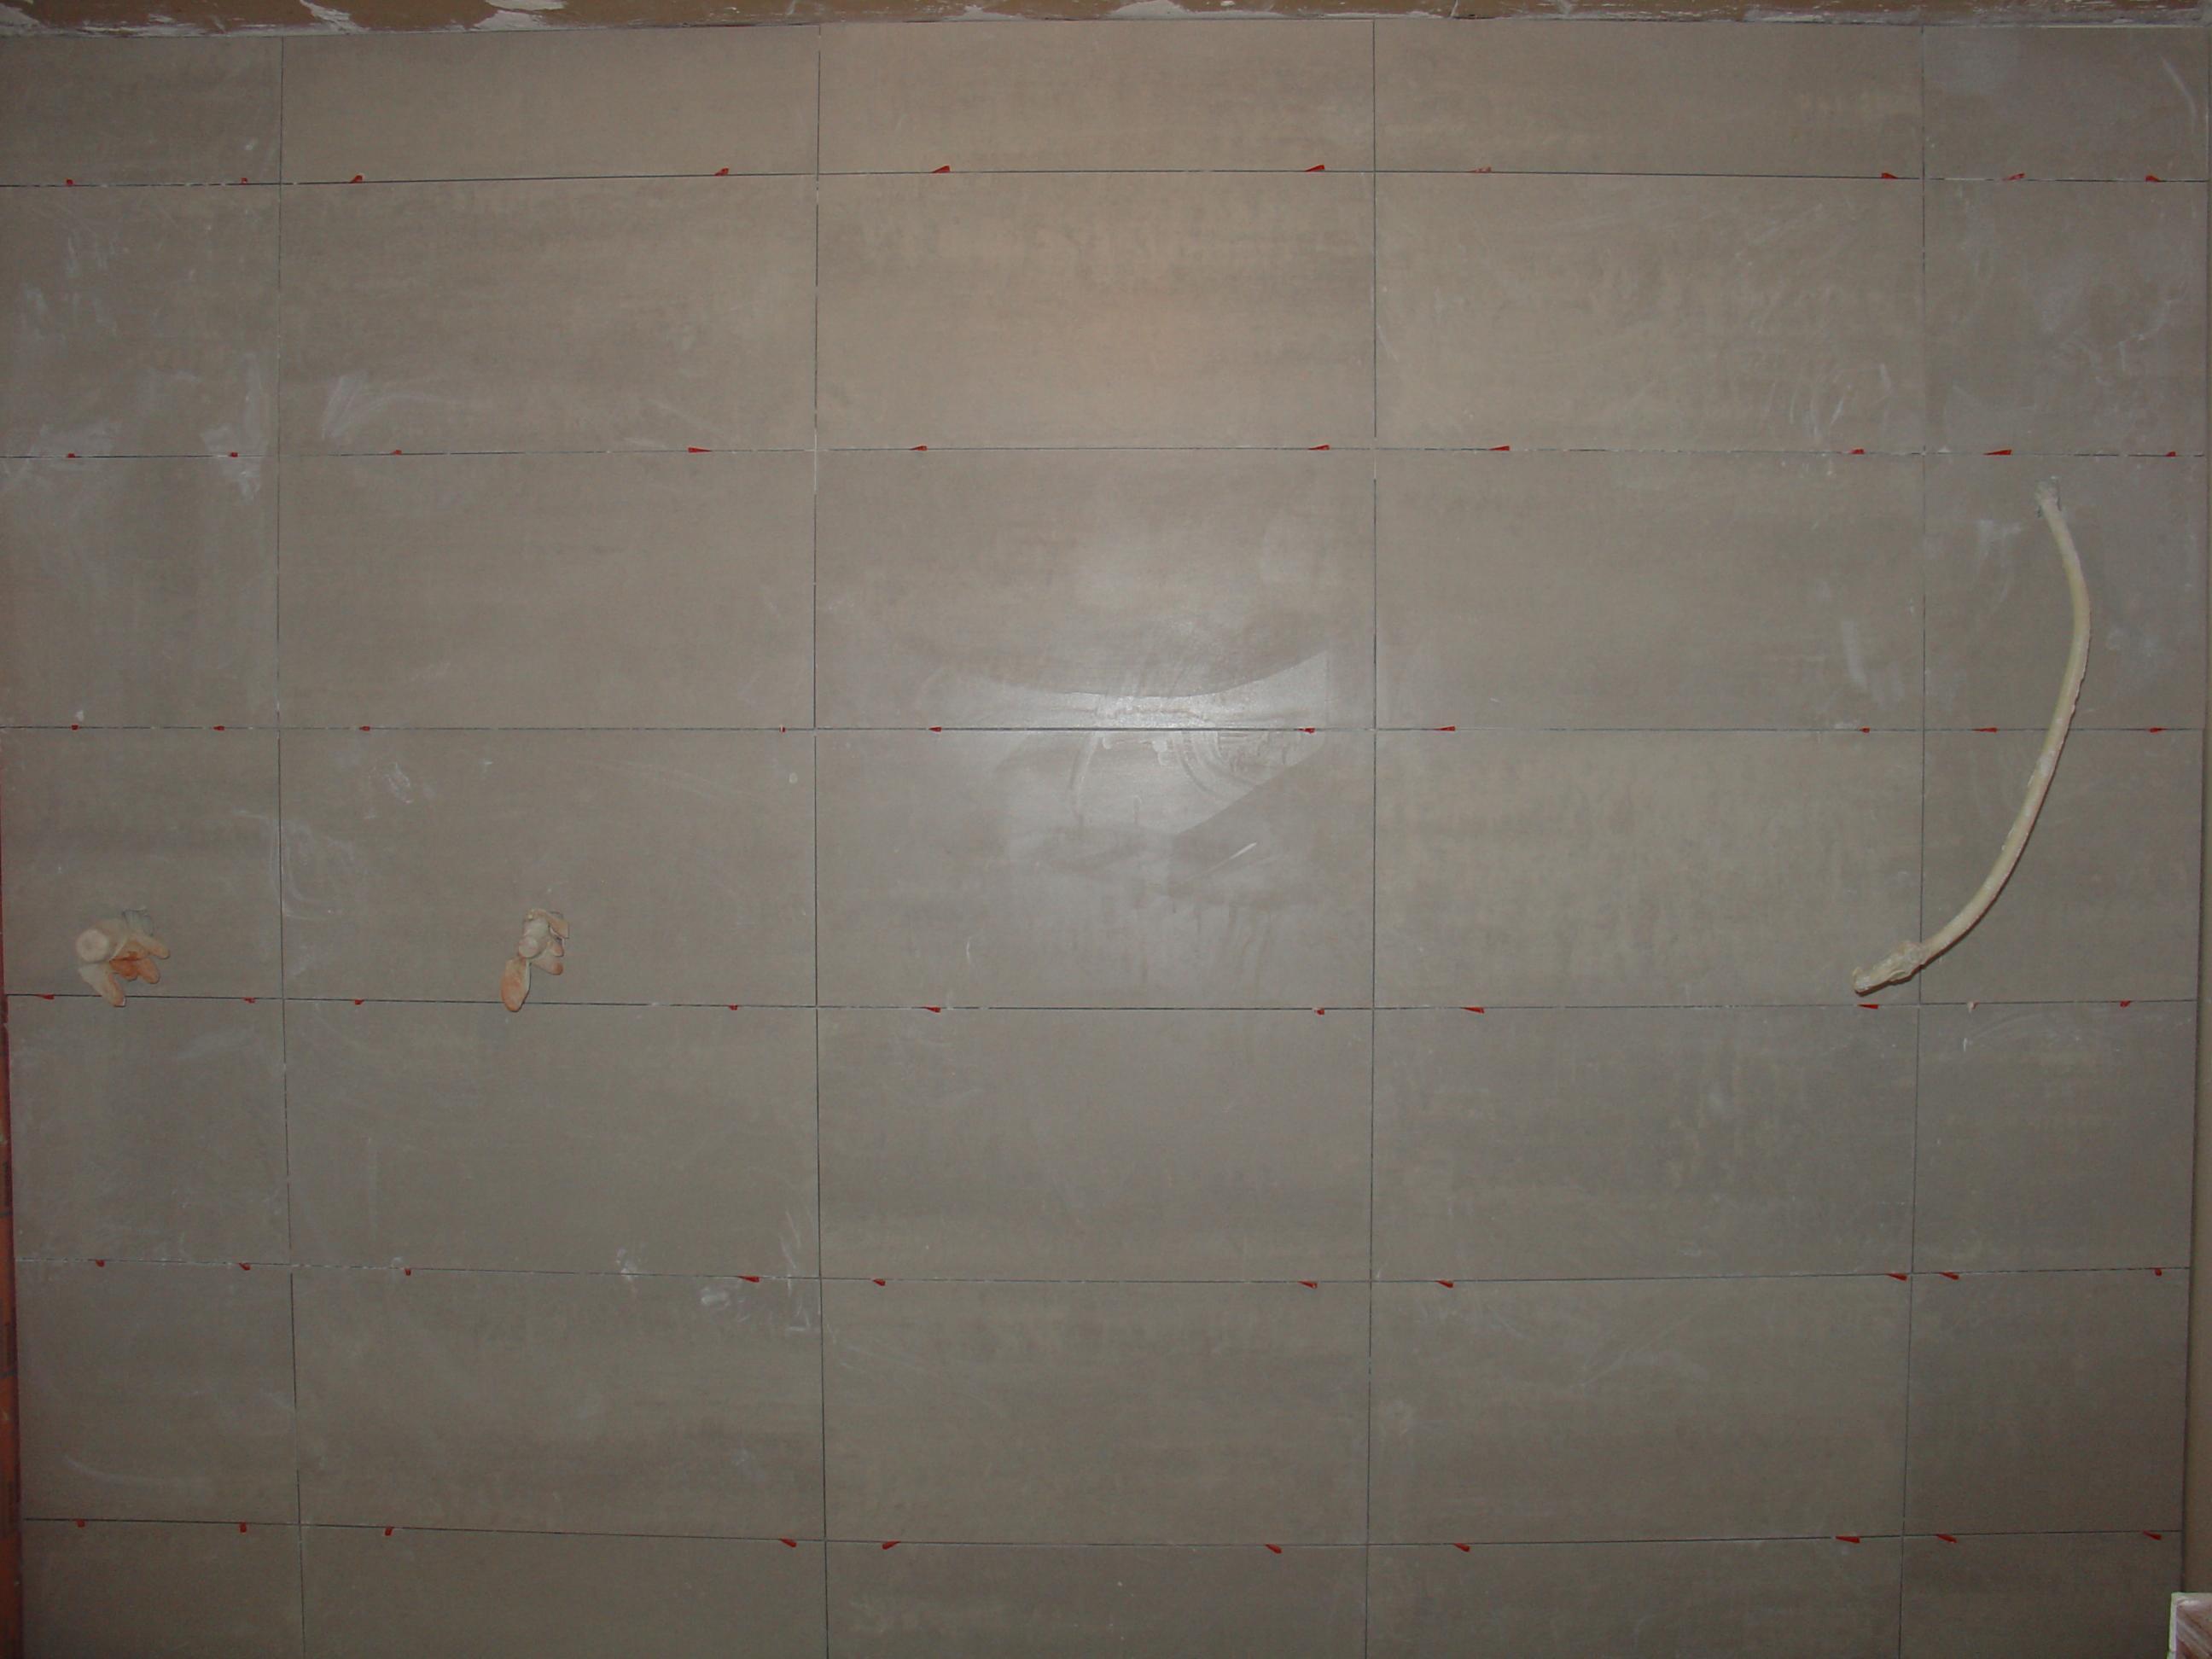 Vloer cementvloer leggen galerij foto 39 s van binnenlandse en moderne binnenhuisarchitectuur for Tegel pvc imitatie tegel cement